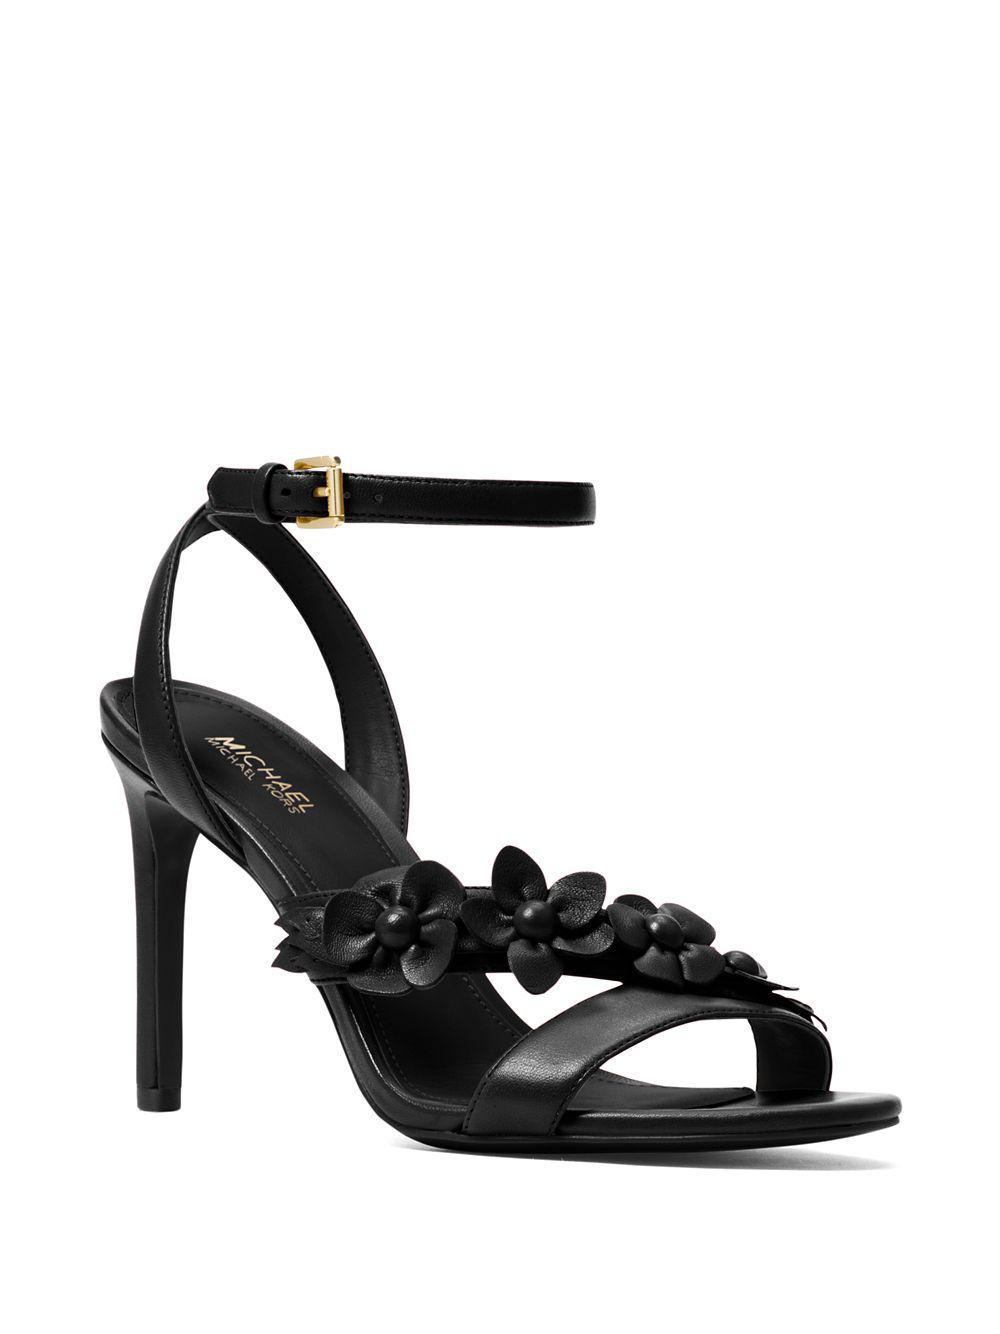 d45686a41f09 Michael Michael Kors Tricia Stiletto Sandals in Black - Lyst